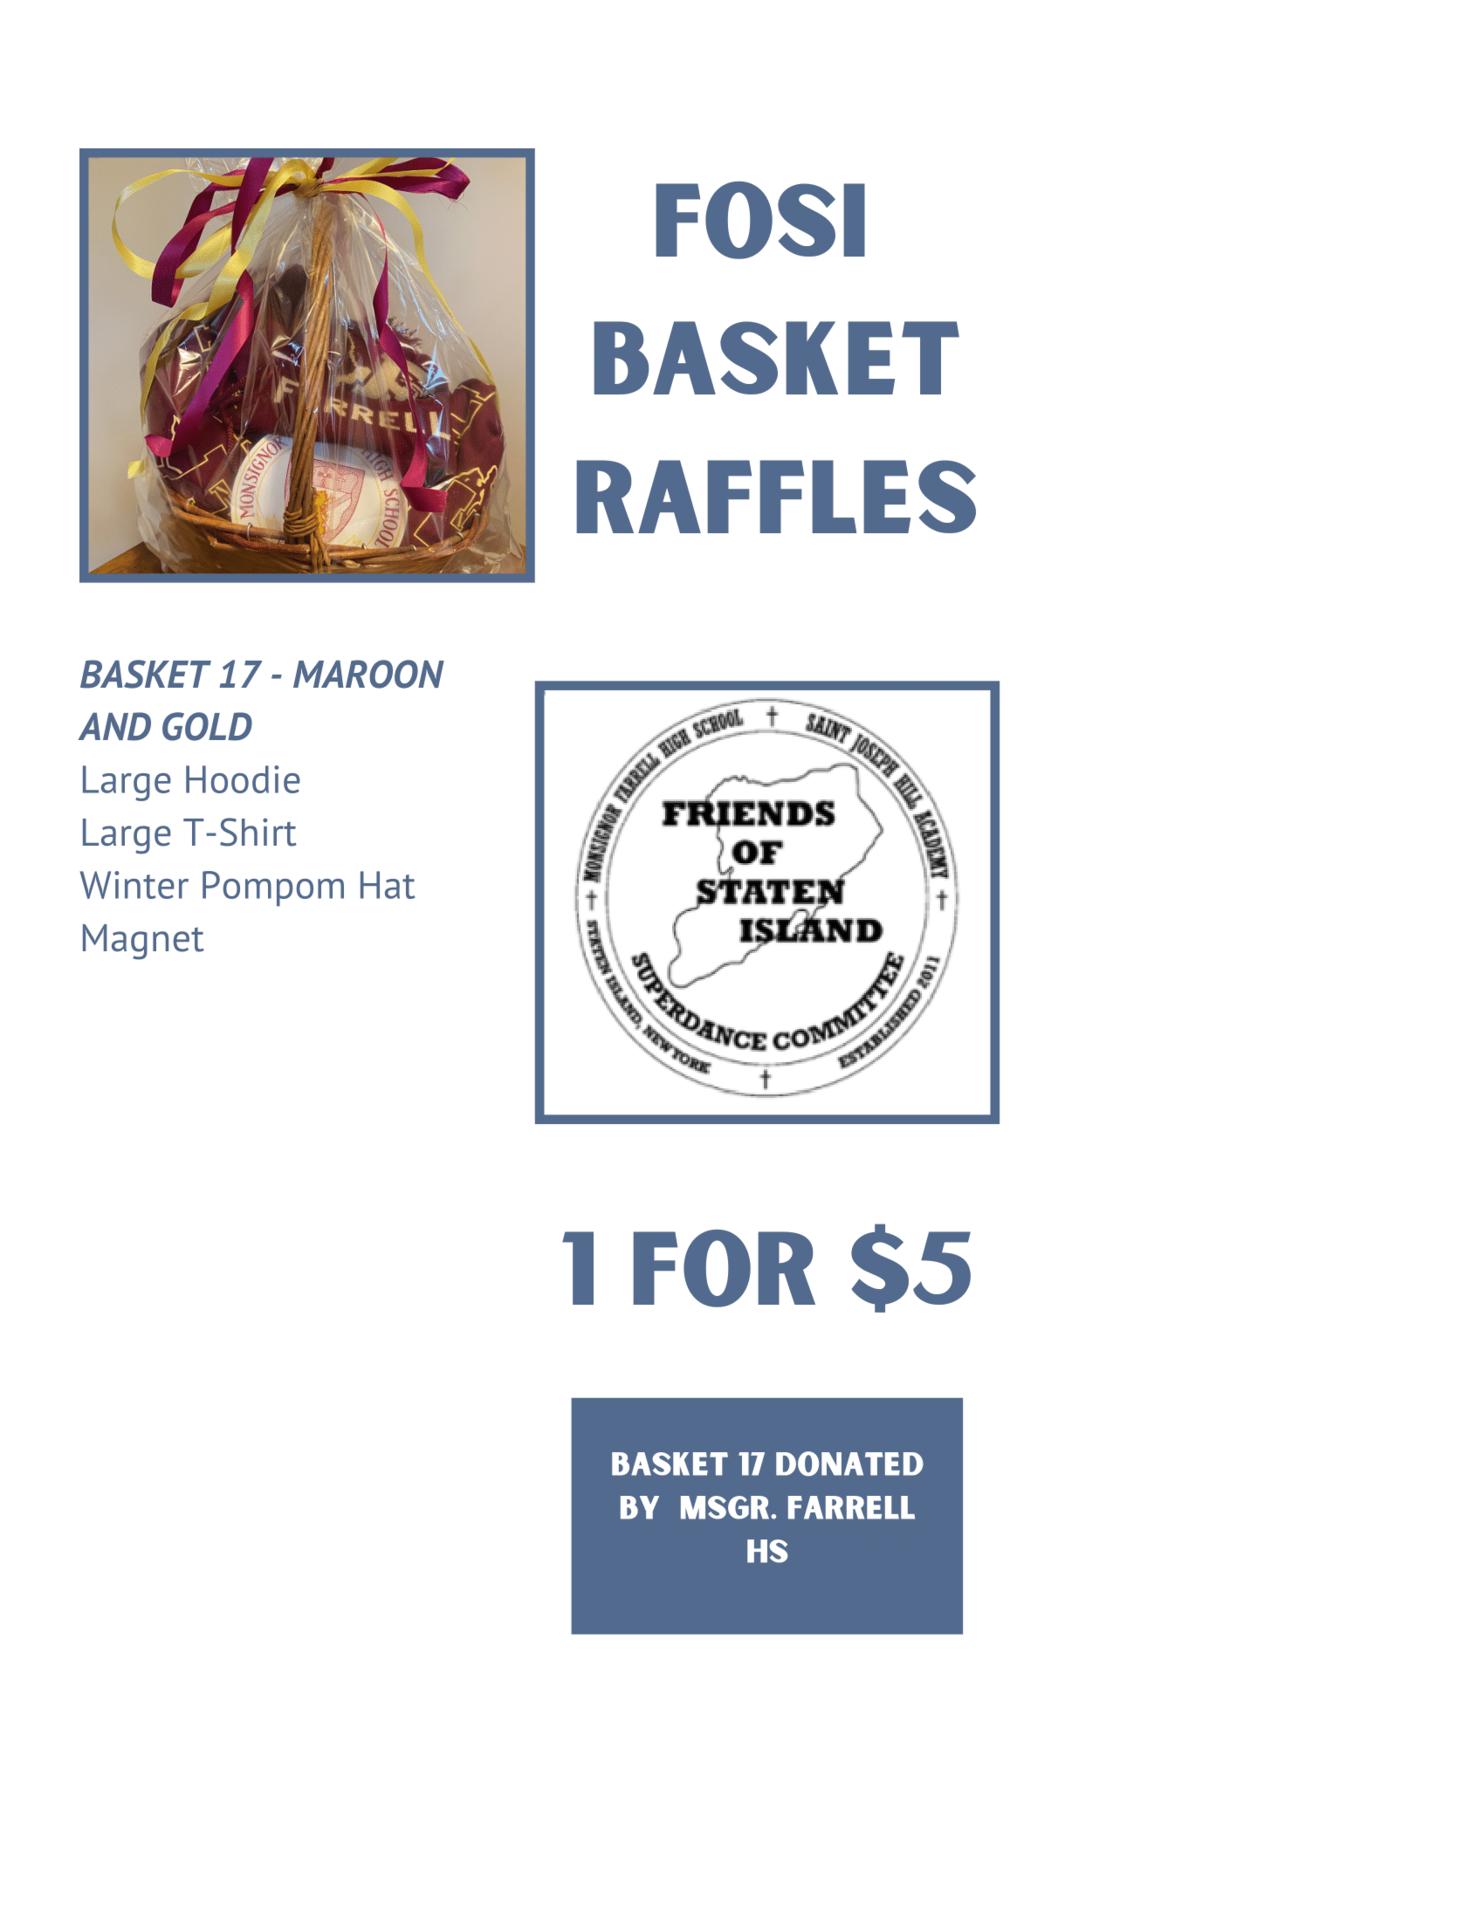 FOSI Raffle Baskets